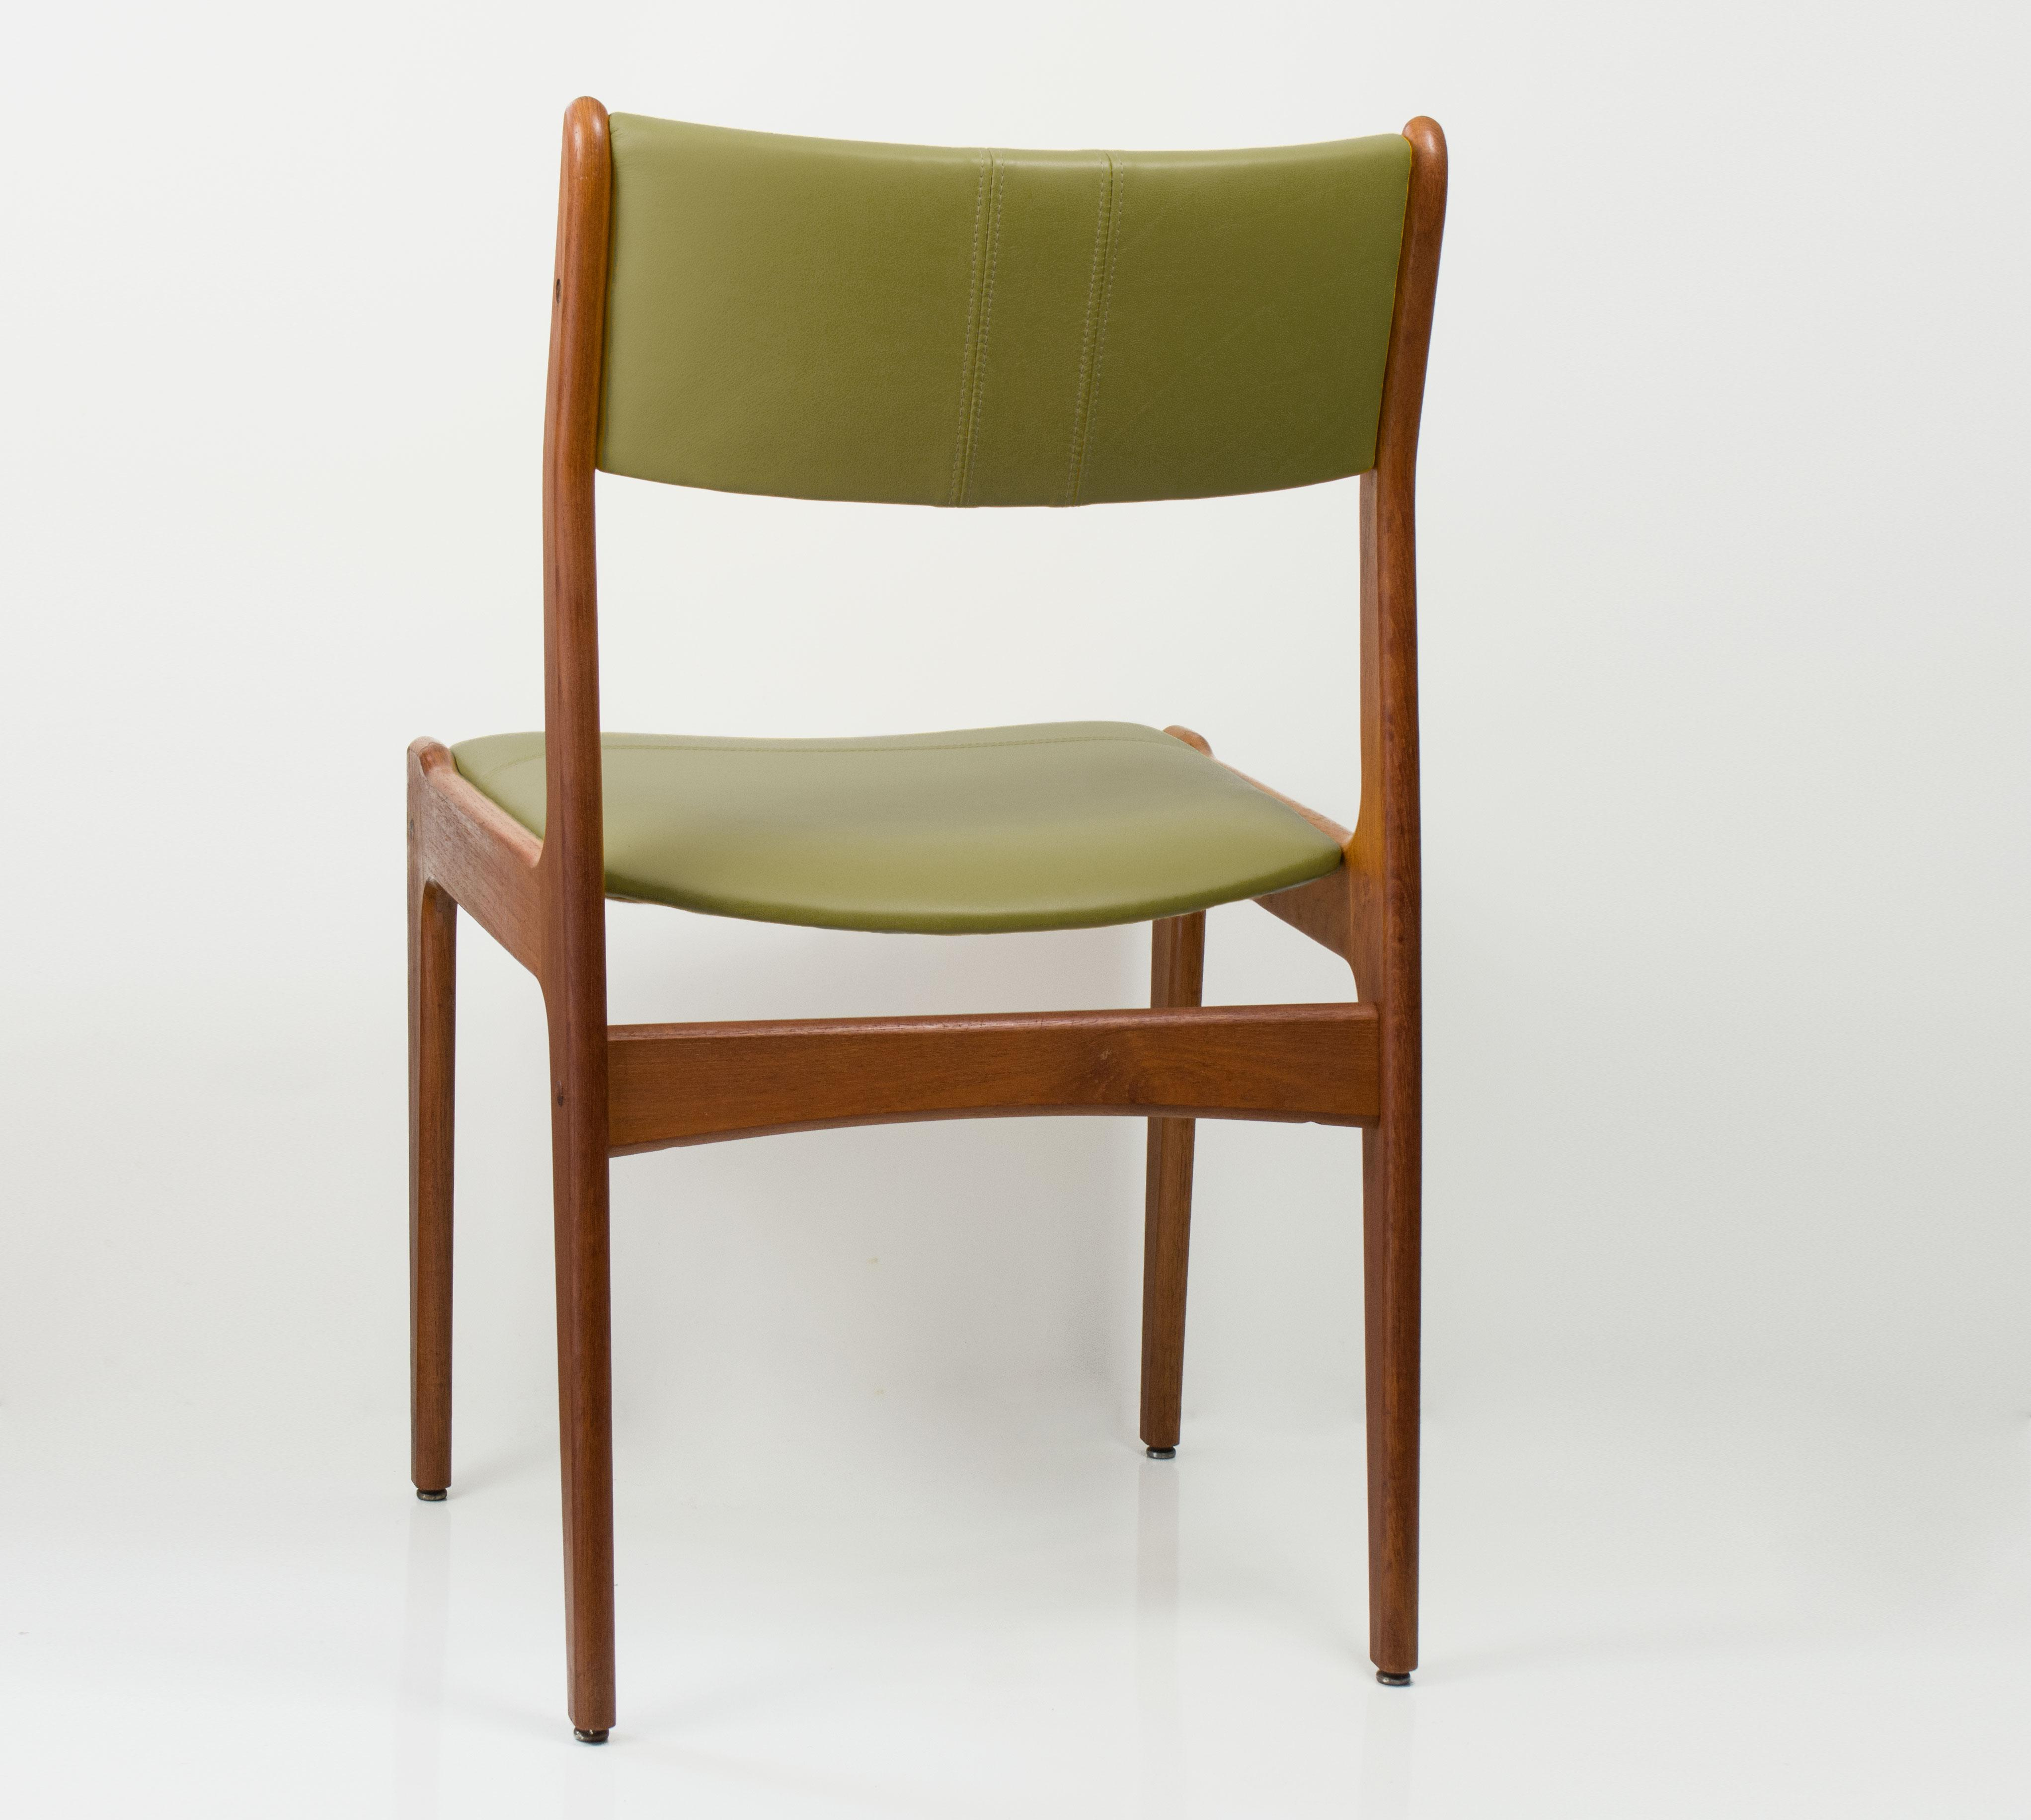 Mid Century Vintage Danish Style Leather U0026 Teak Chairs  Set Of 4 For Sale